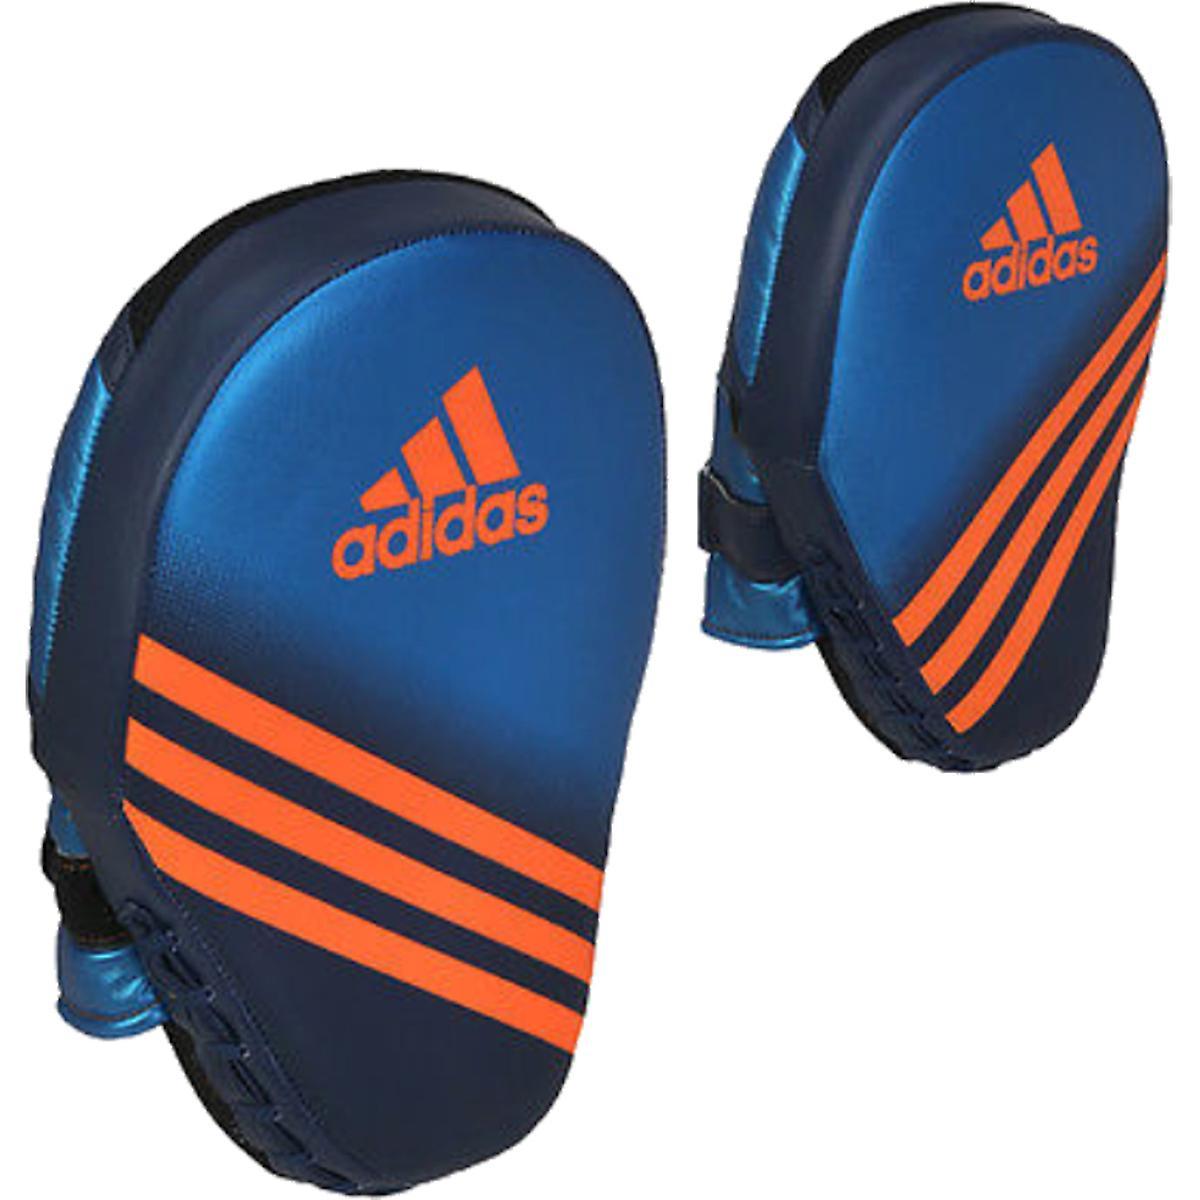 Adidas Curved Speed Training Foucs Mitt - Metallic Blue/Collegiate Navy